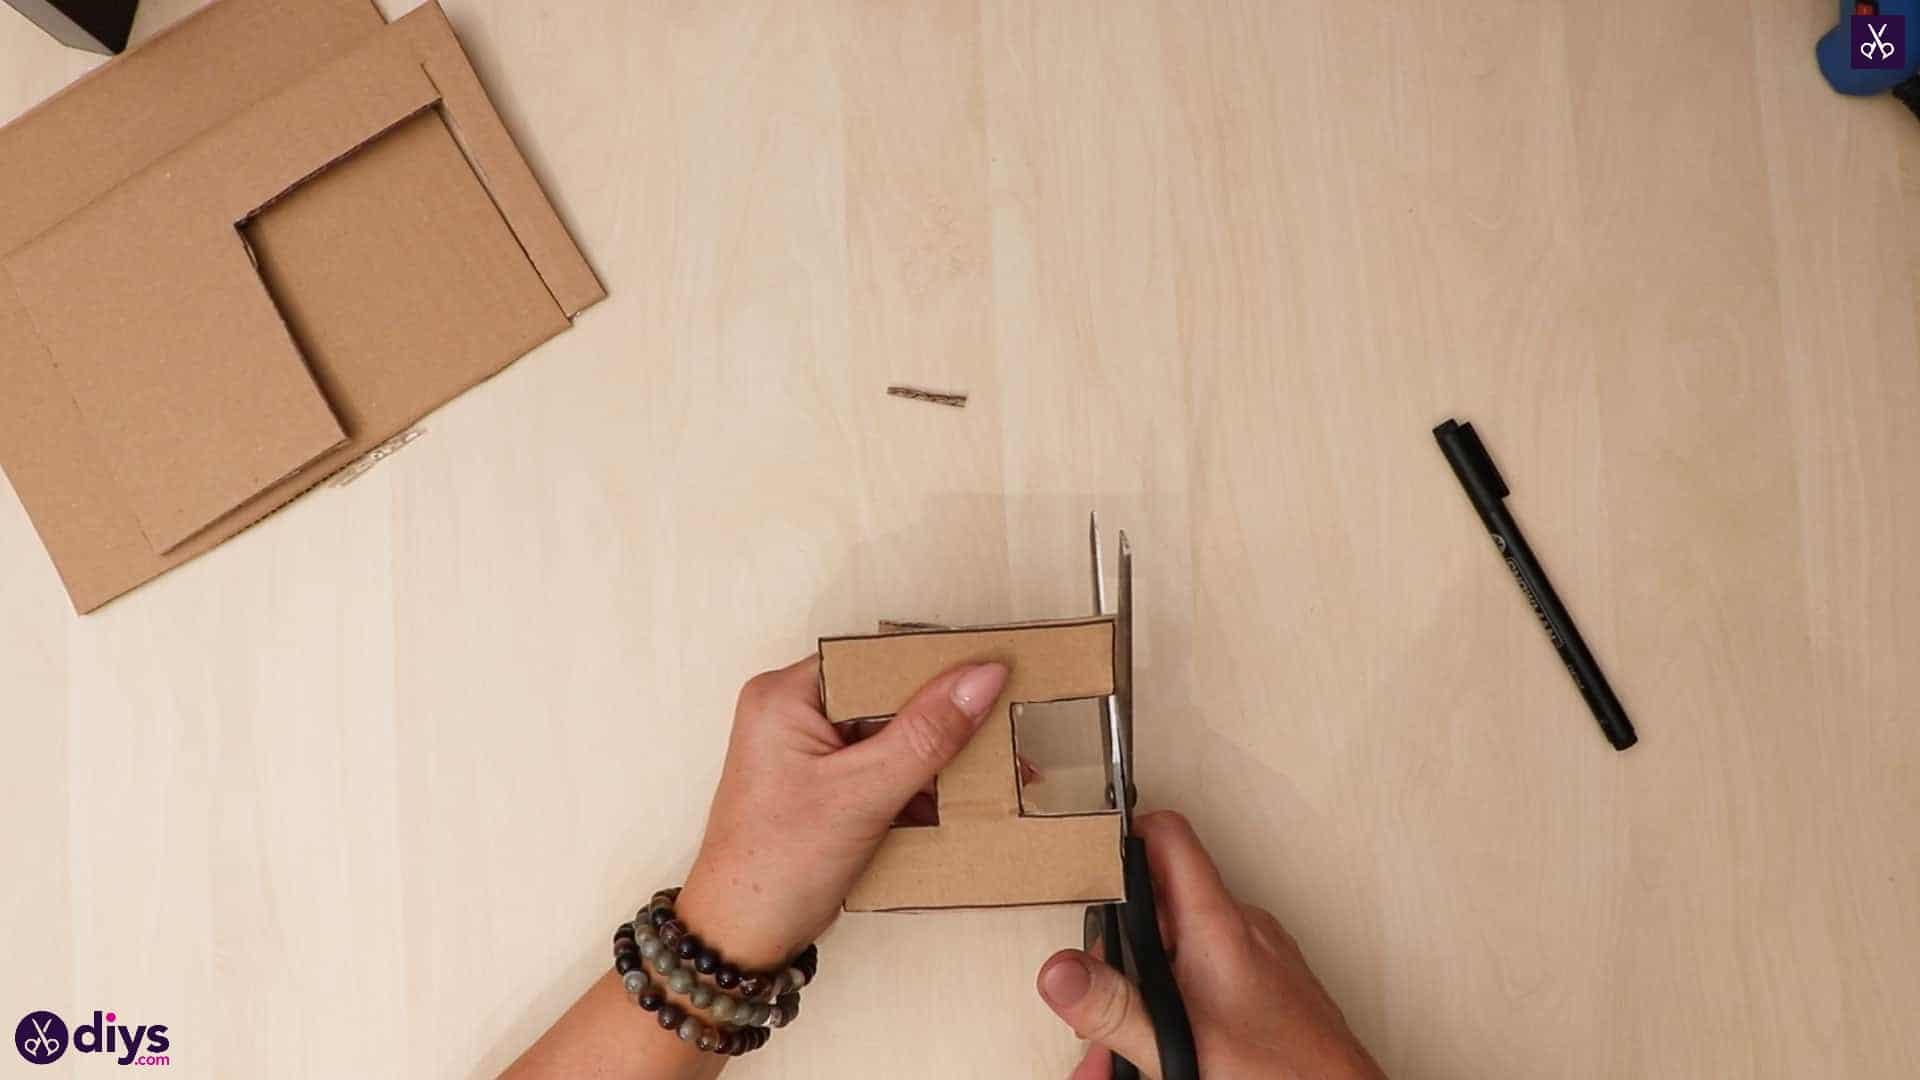 Diy concrete letters cut cardboard